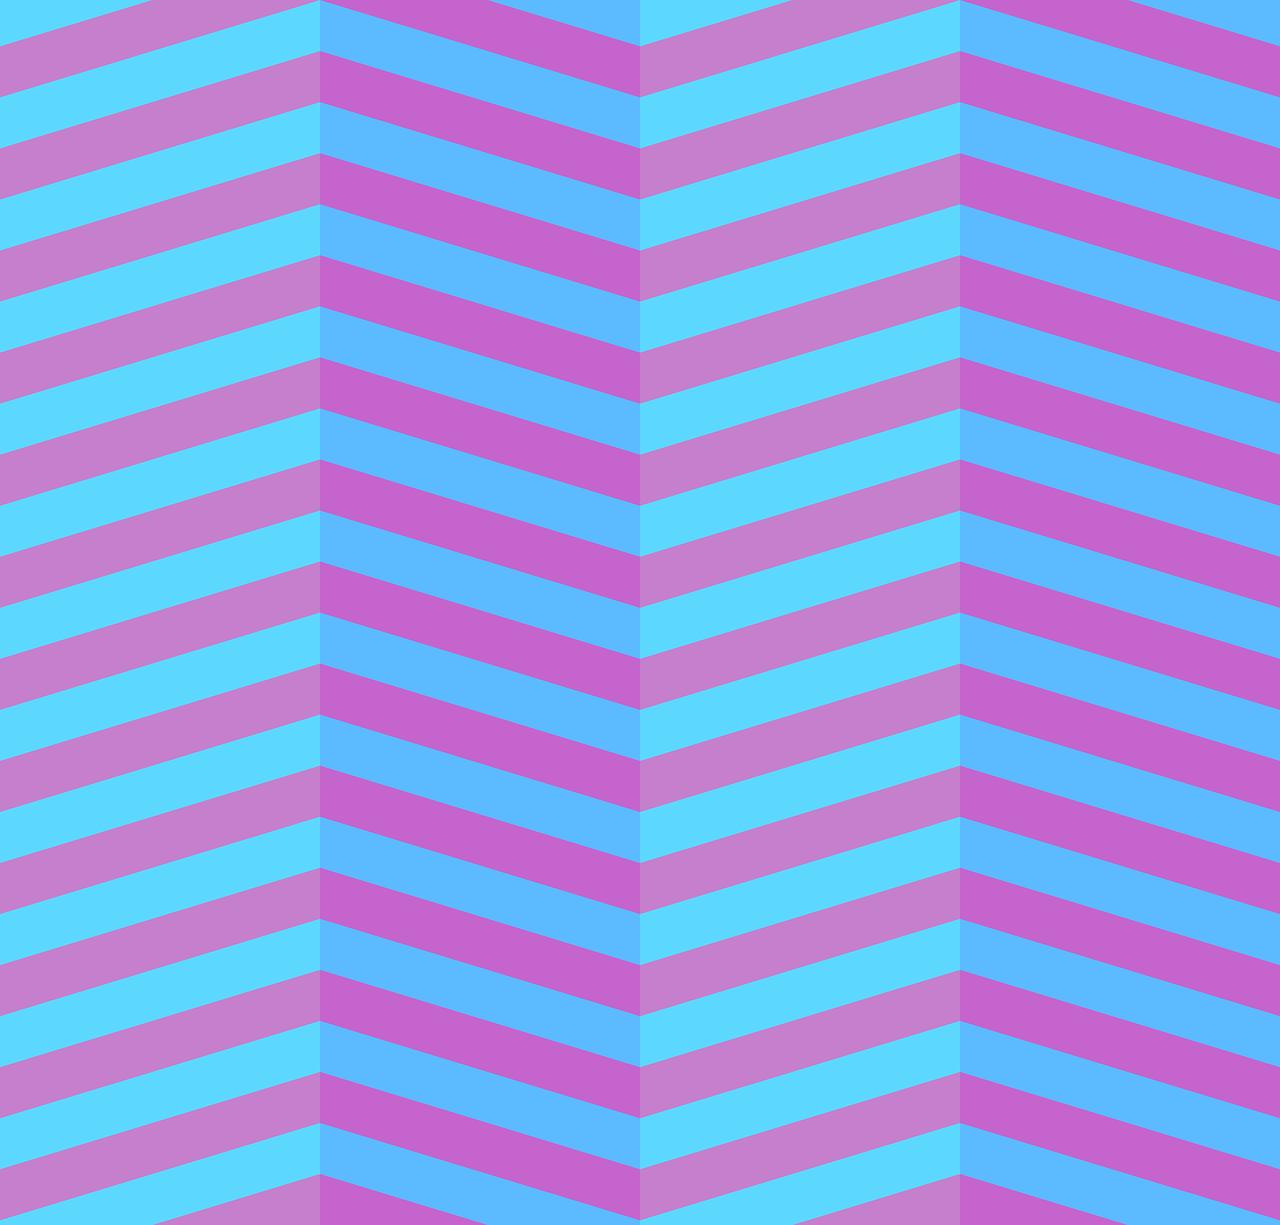 zigzag blue pink